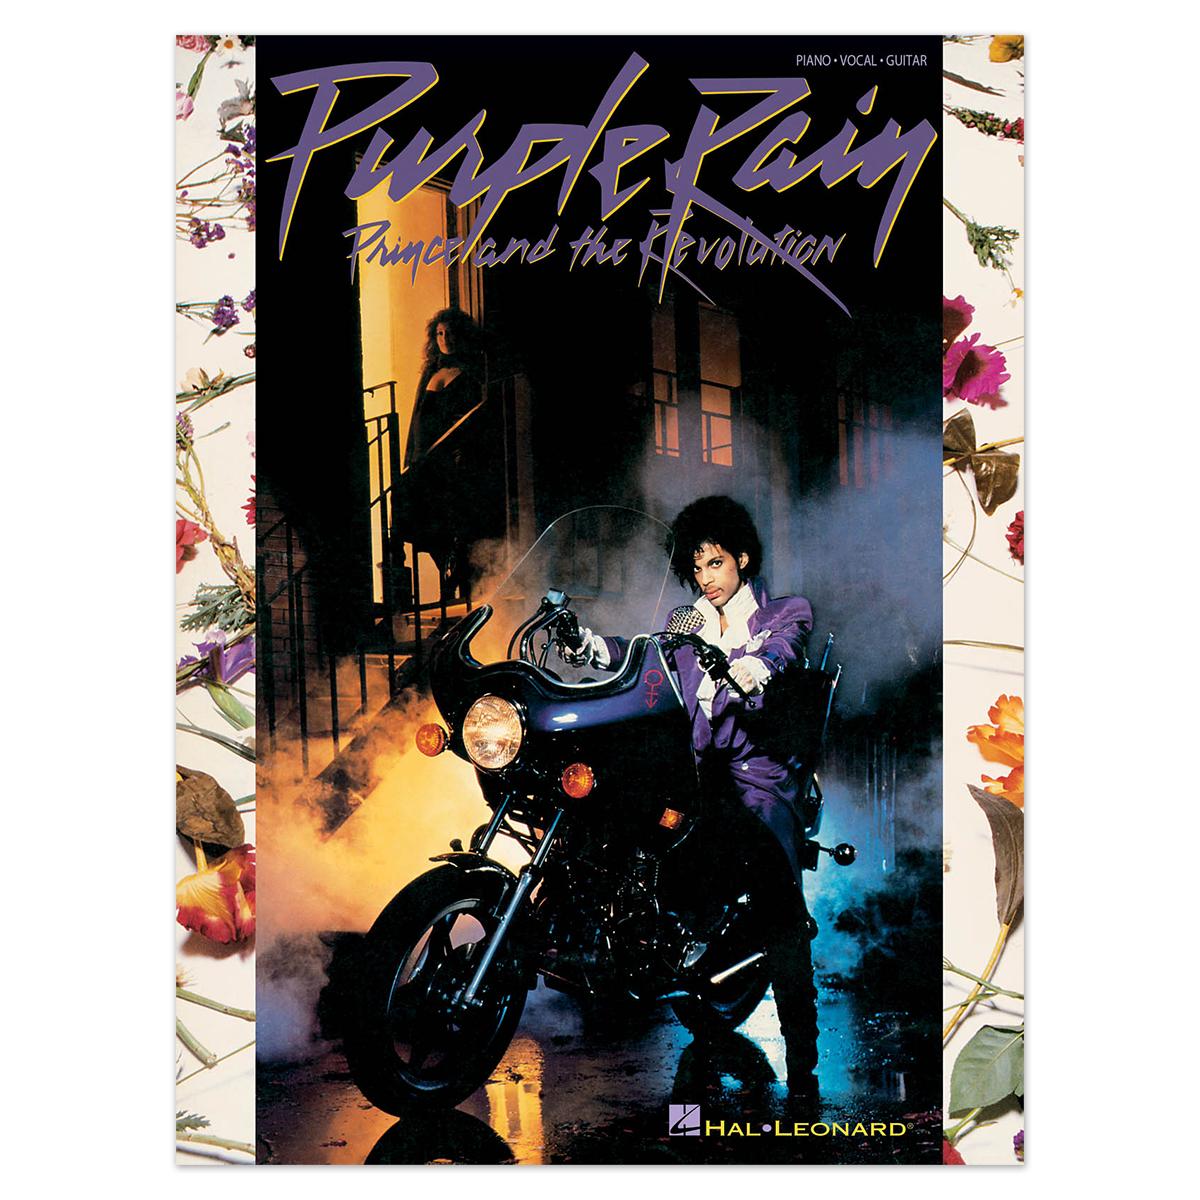 Prince - Purple Rain (Artist Songbook - Piano/Vocal/Guitar)